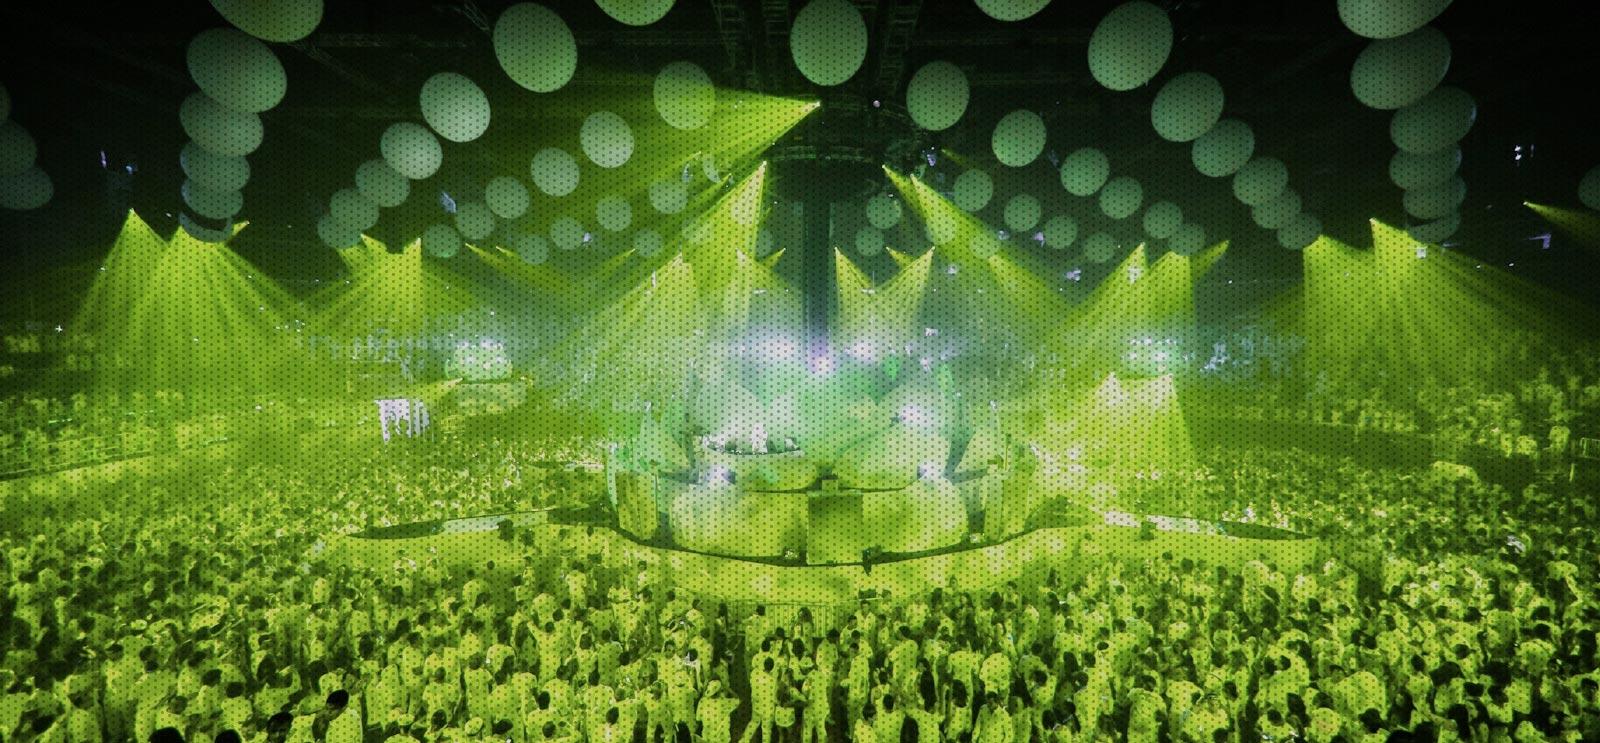 revslider-music-wordpress-theme-green